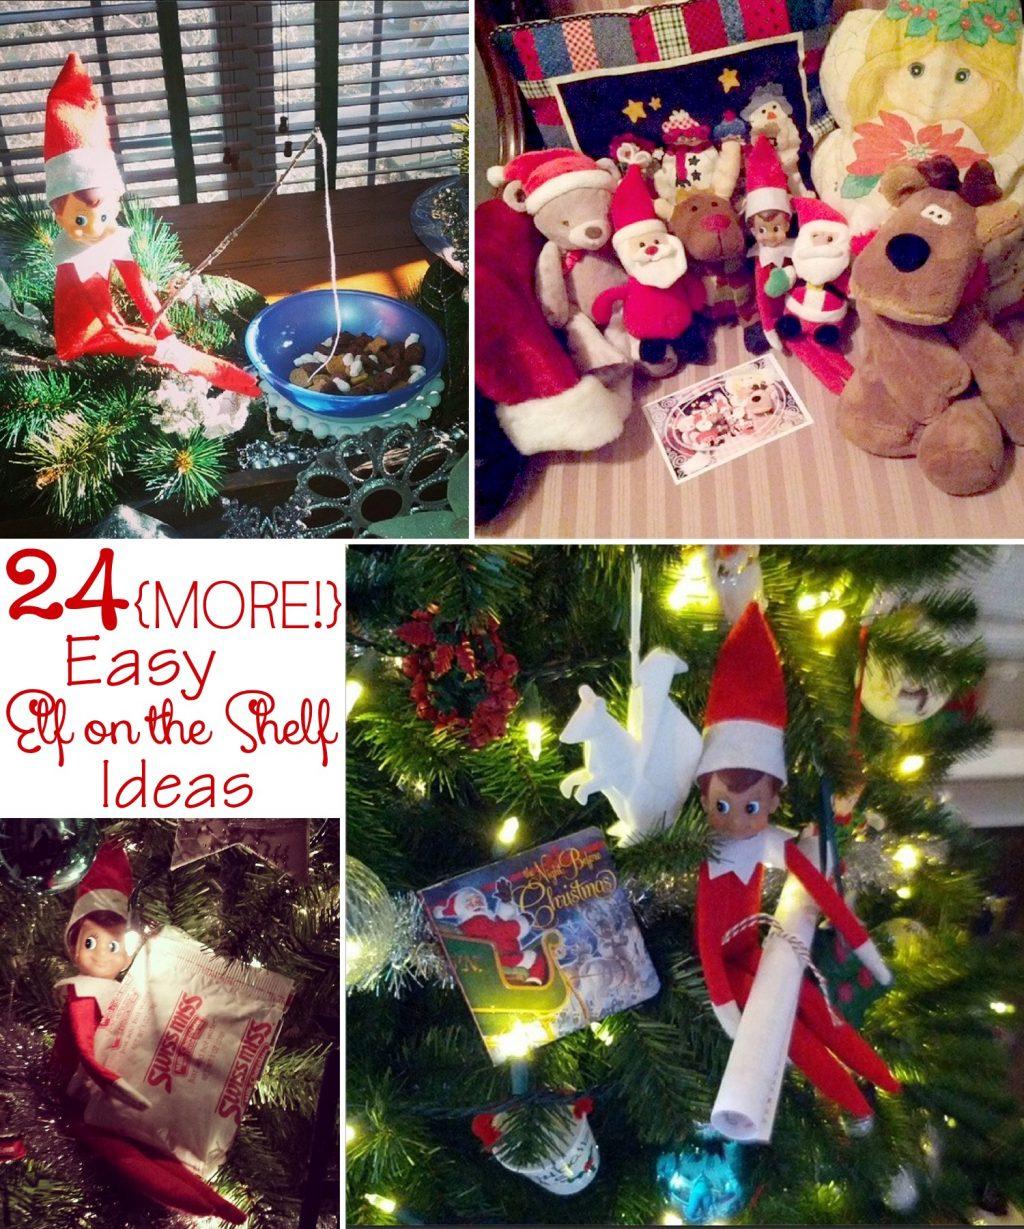 24 More Easy Elf On The Shelf Ideas The Scrap Shoppe